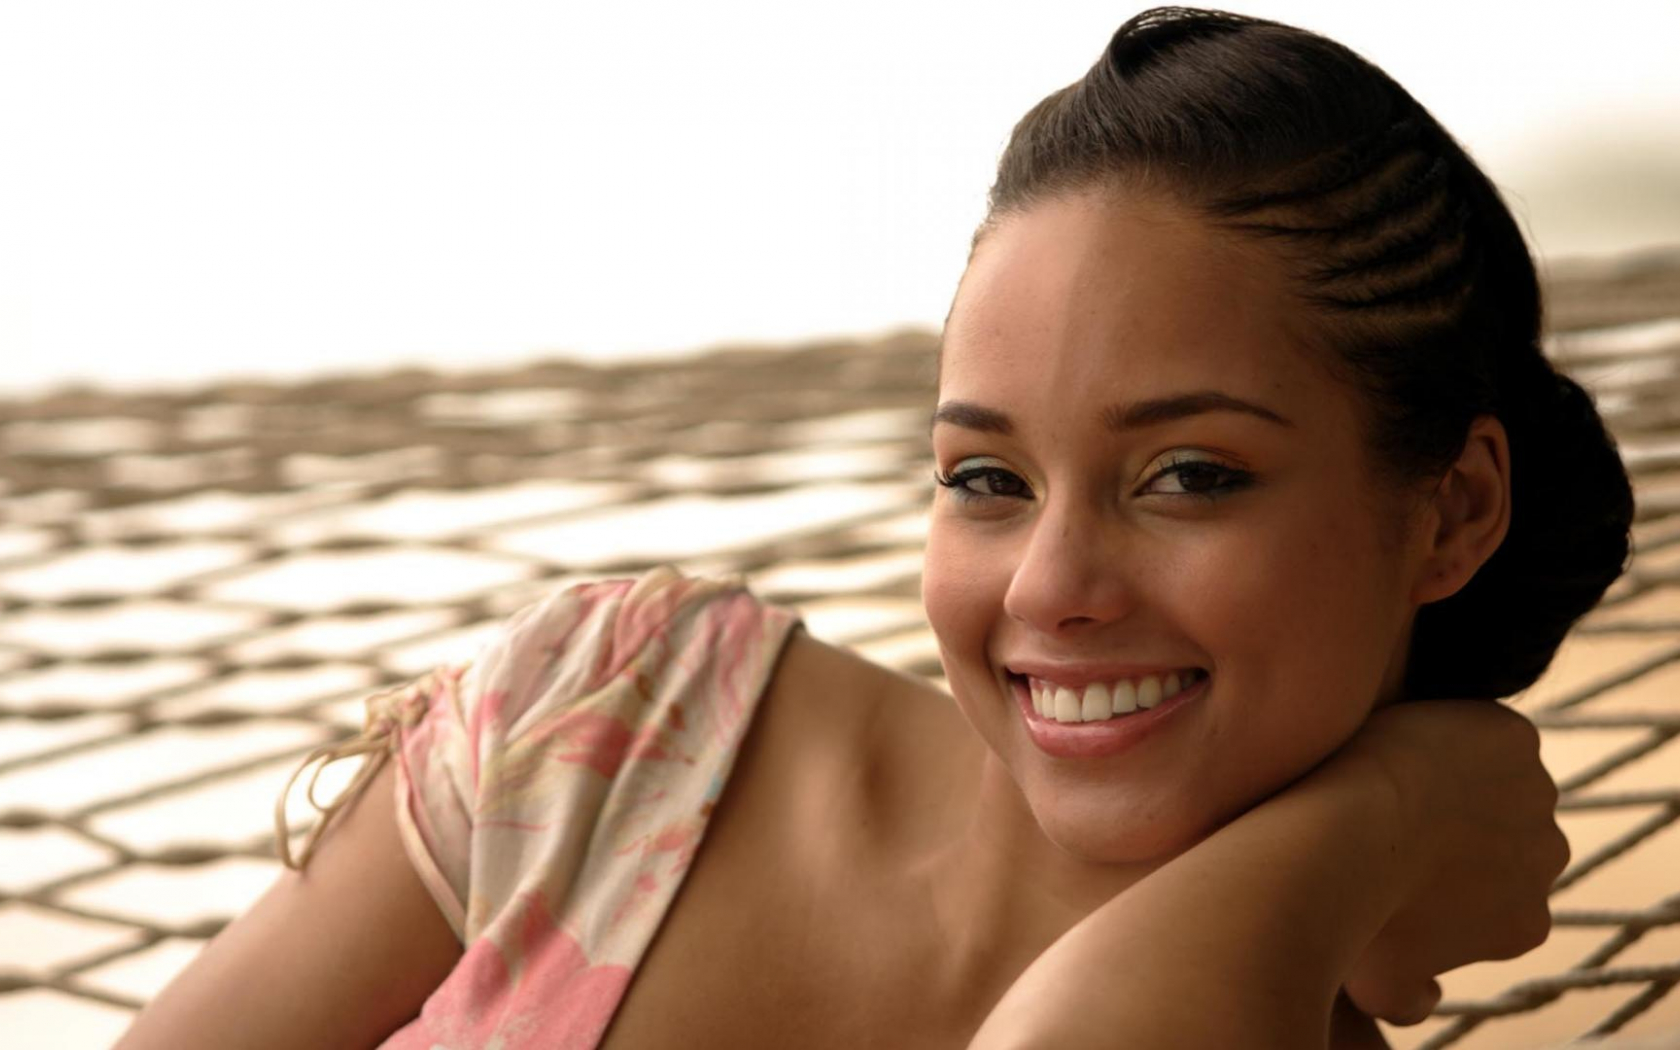 Alicia Smiles free download download wallpaper alicia keys smiles 1920 x